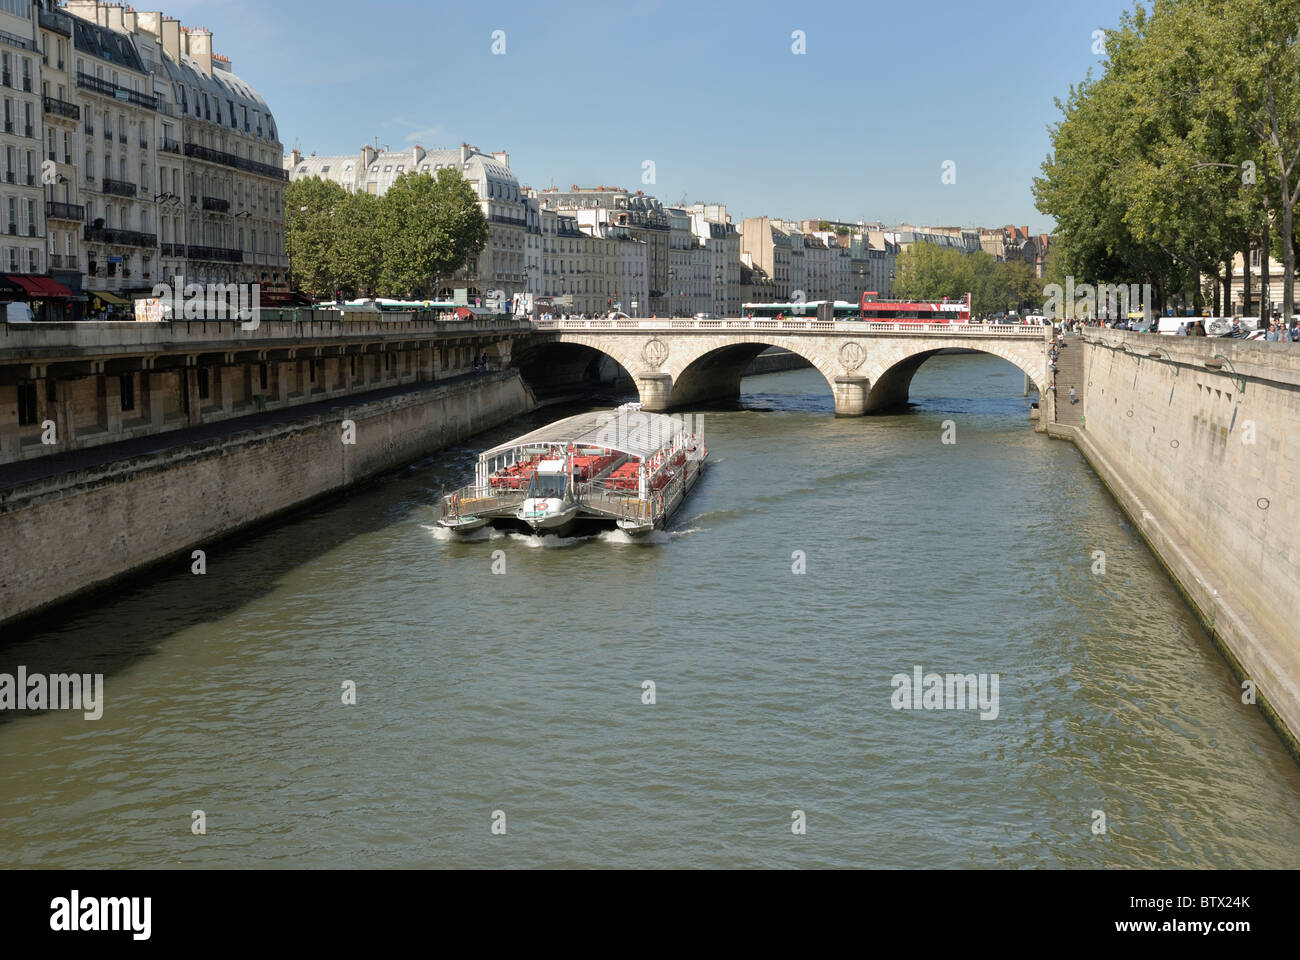 Excursion boat carrying tourists traveling down the River Seine towards Pont au Change, Paris France. - Stock Image